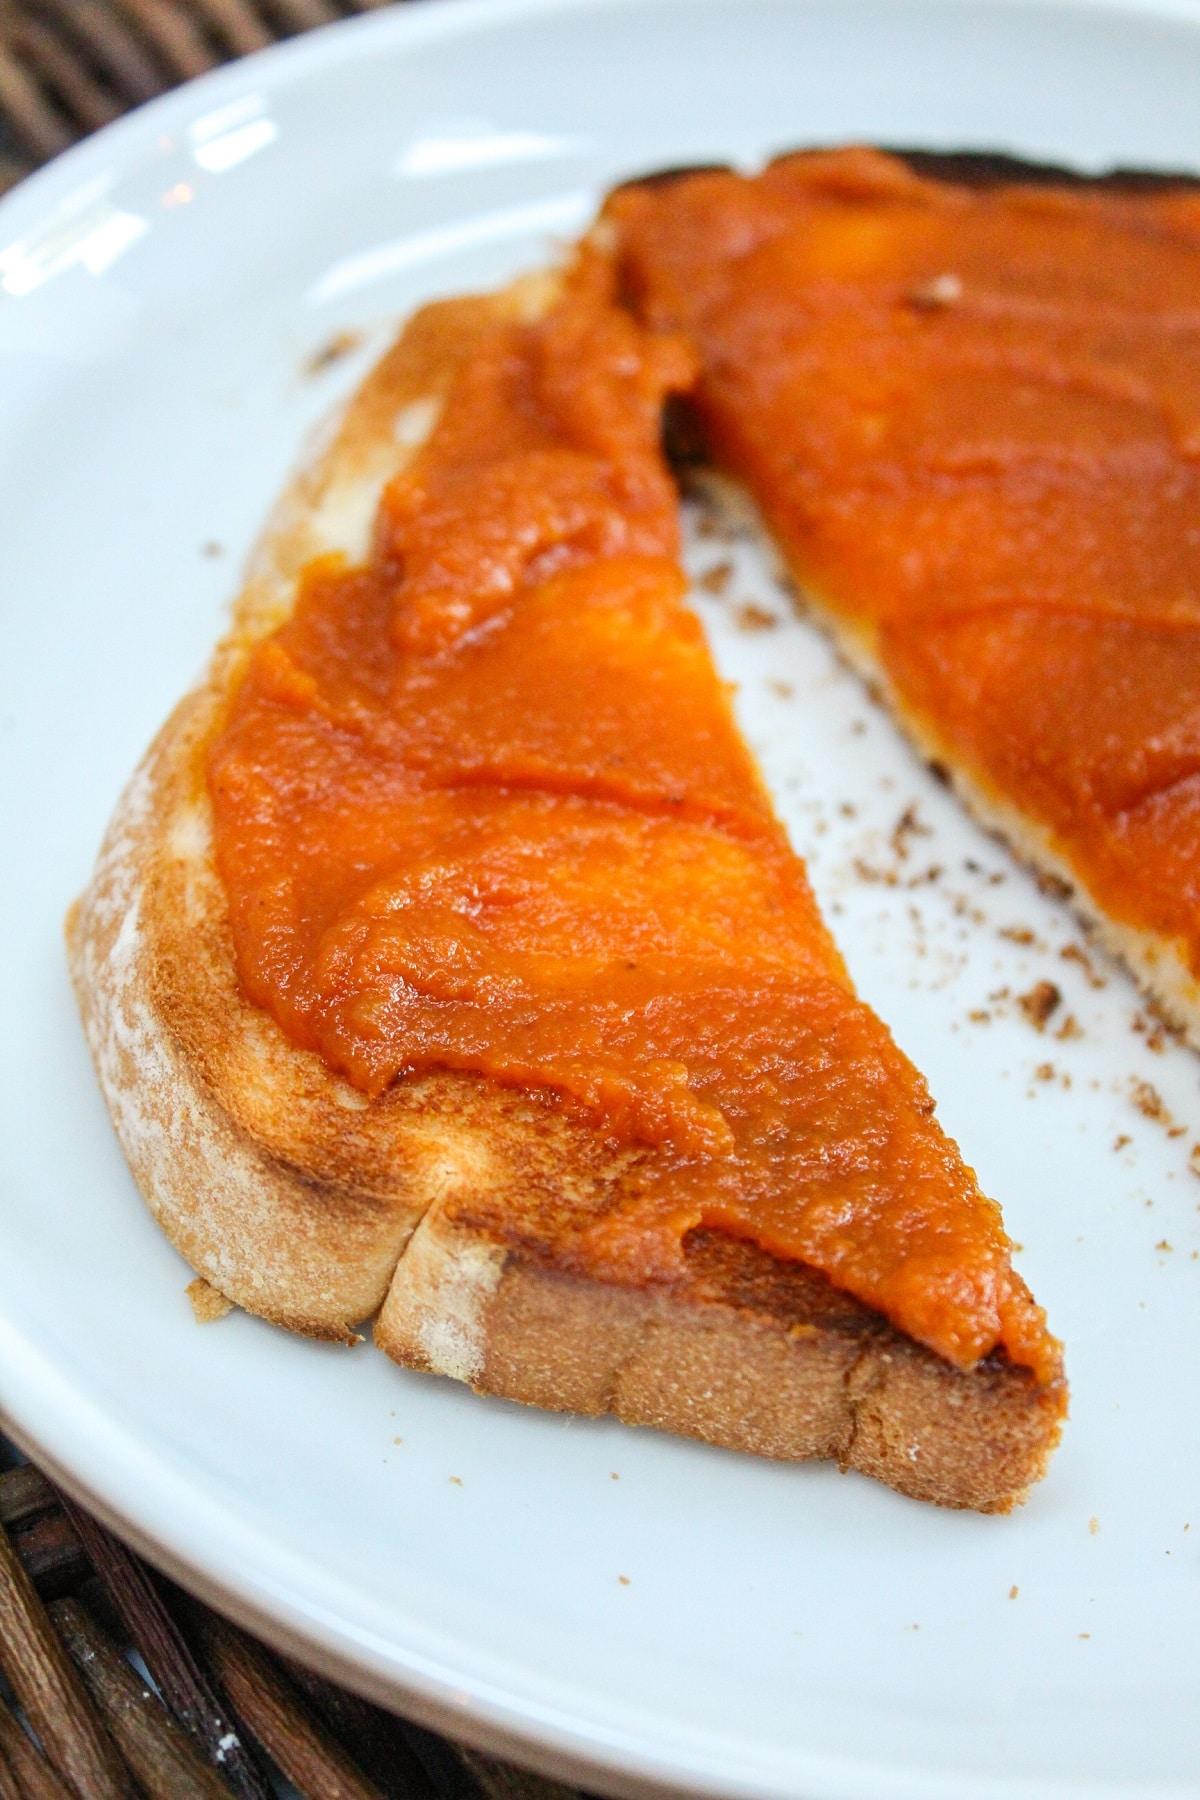 pumpkin butter on toast cut in half